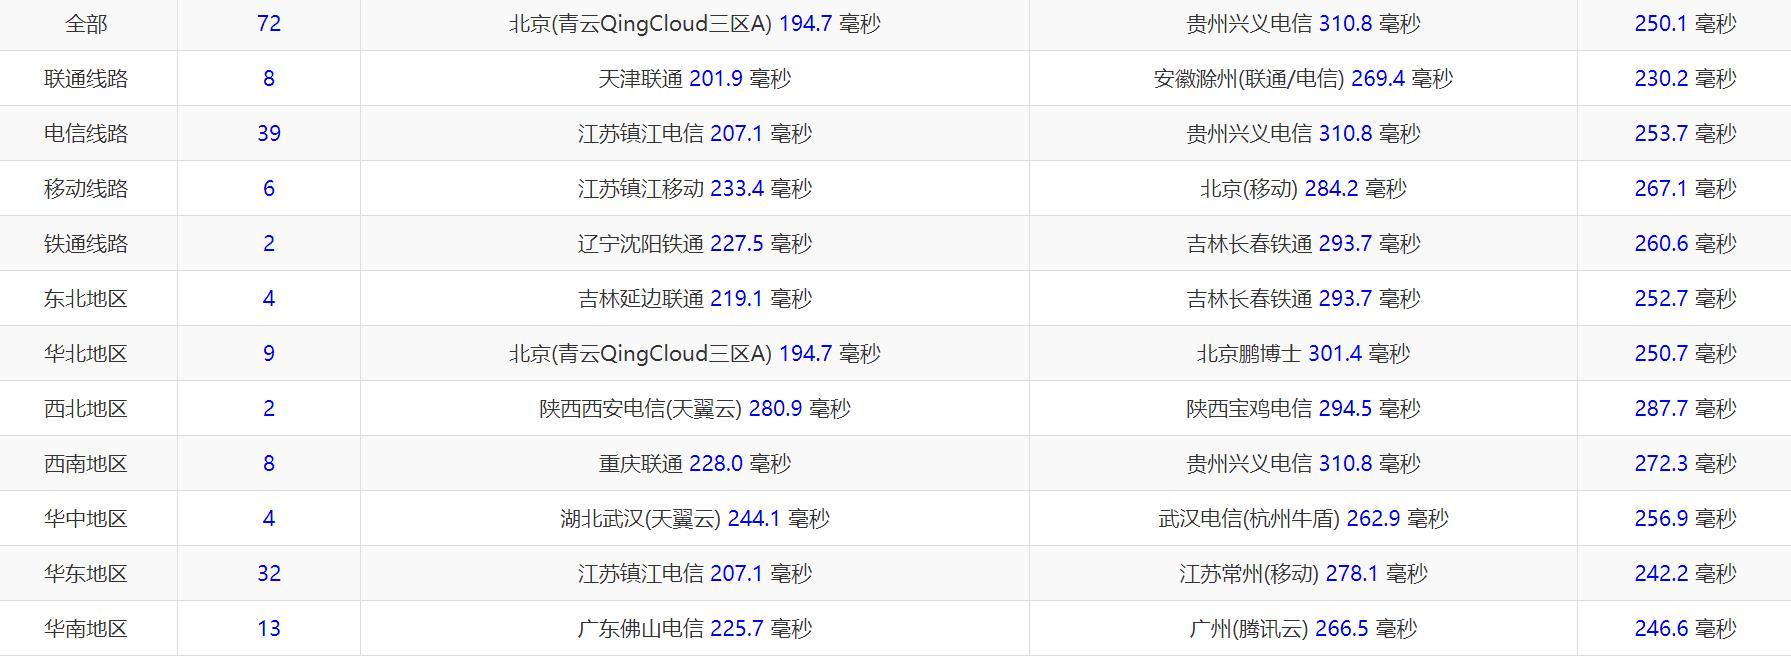 羊毛党之家 AlphaRacks 1GB内存 洛杉矶QN KVM VPS测评 https://yangmaodang.org